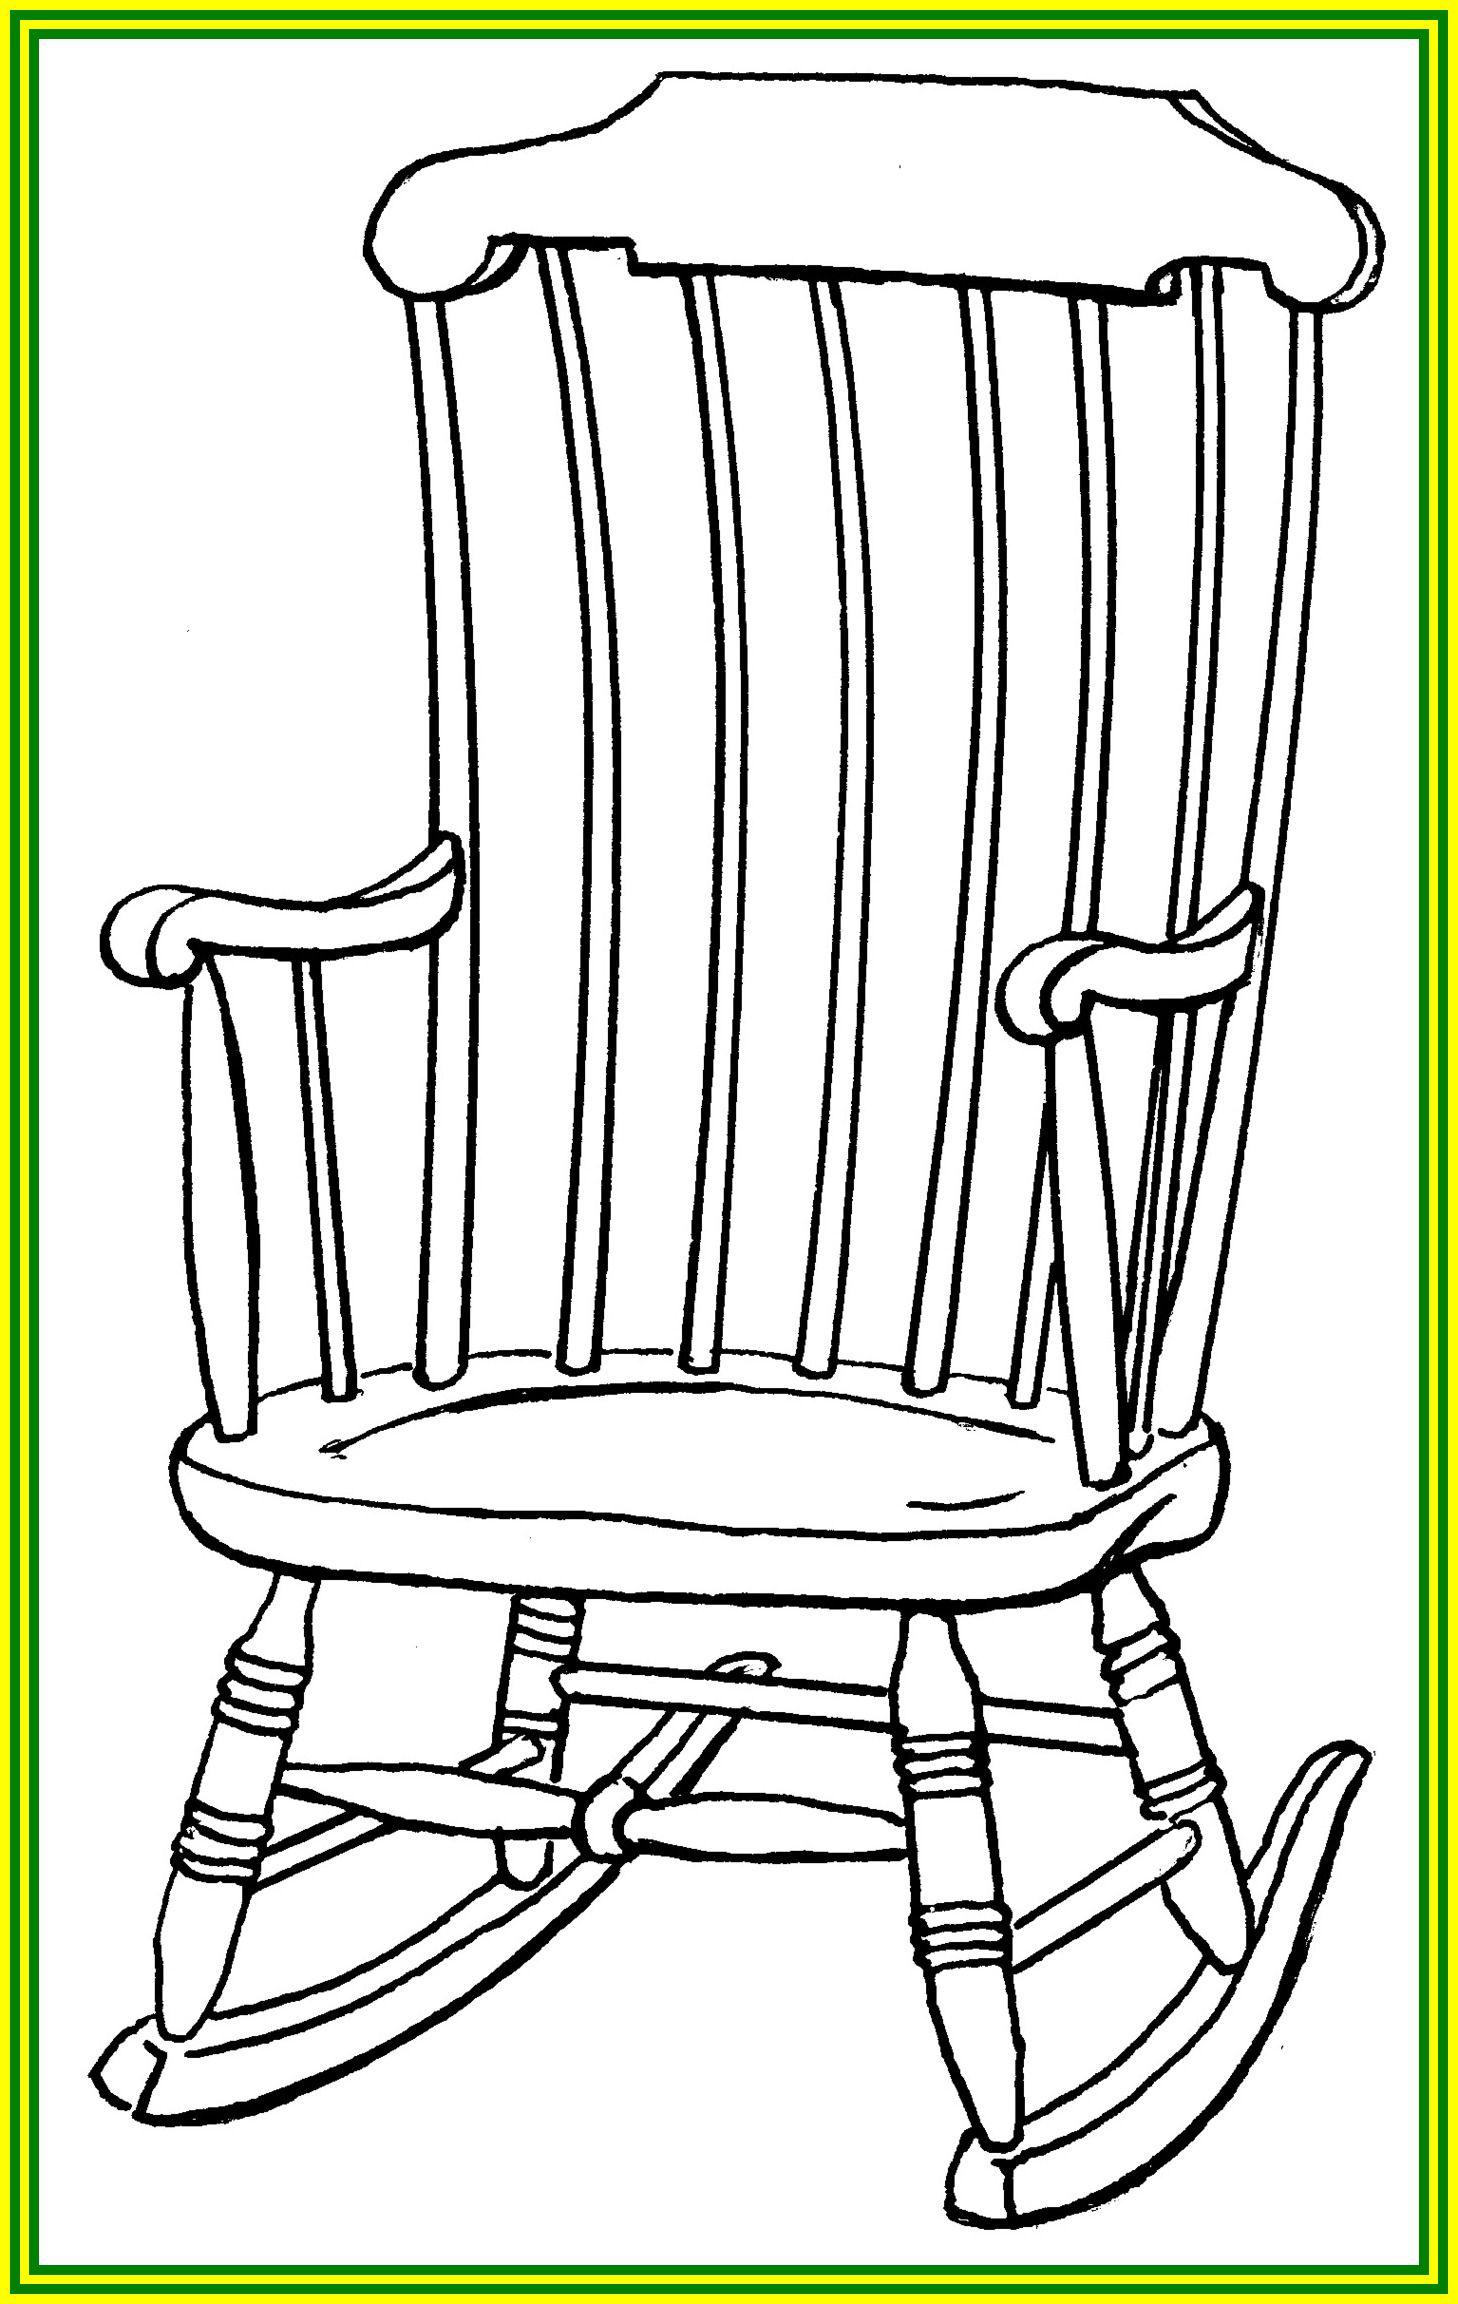 Outdoor Furniture Top View Set 12 For Landscape Design Vector Illustration Landscape Design Design Furniture